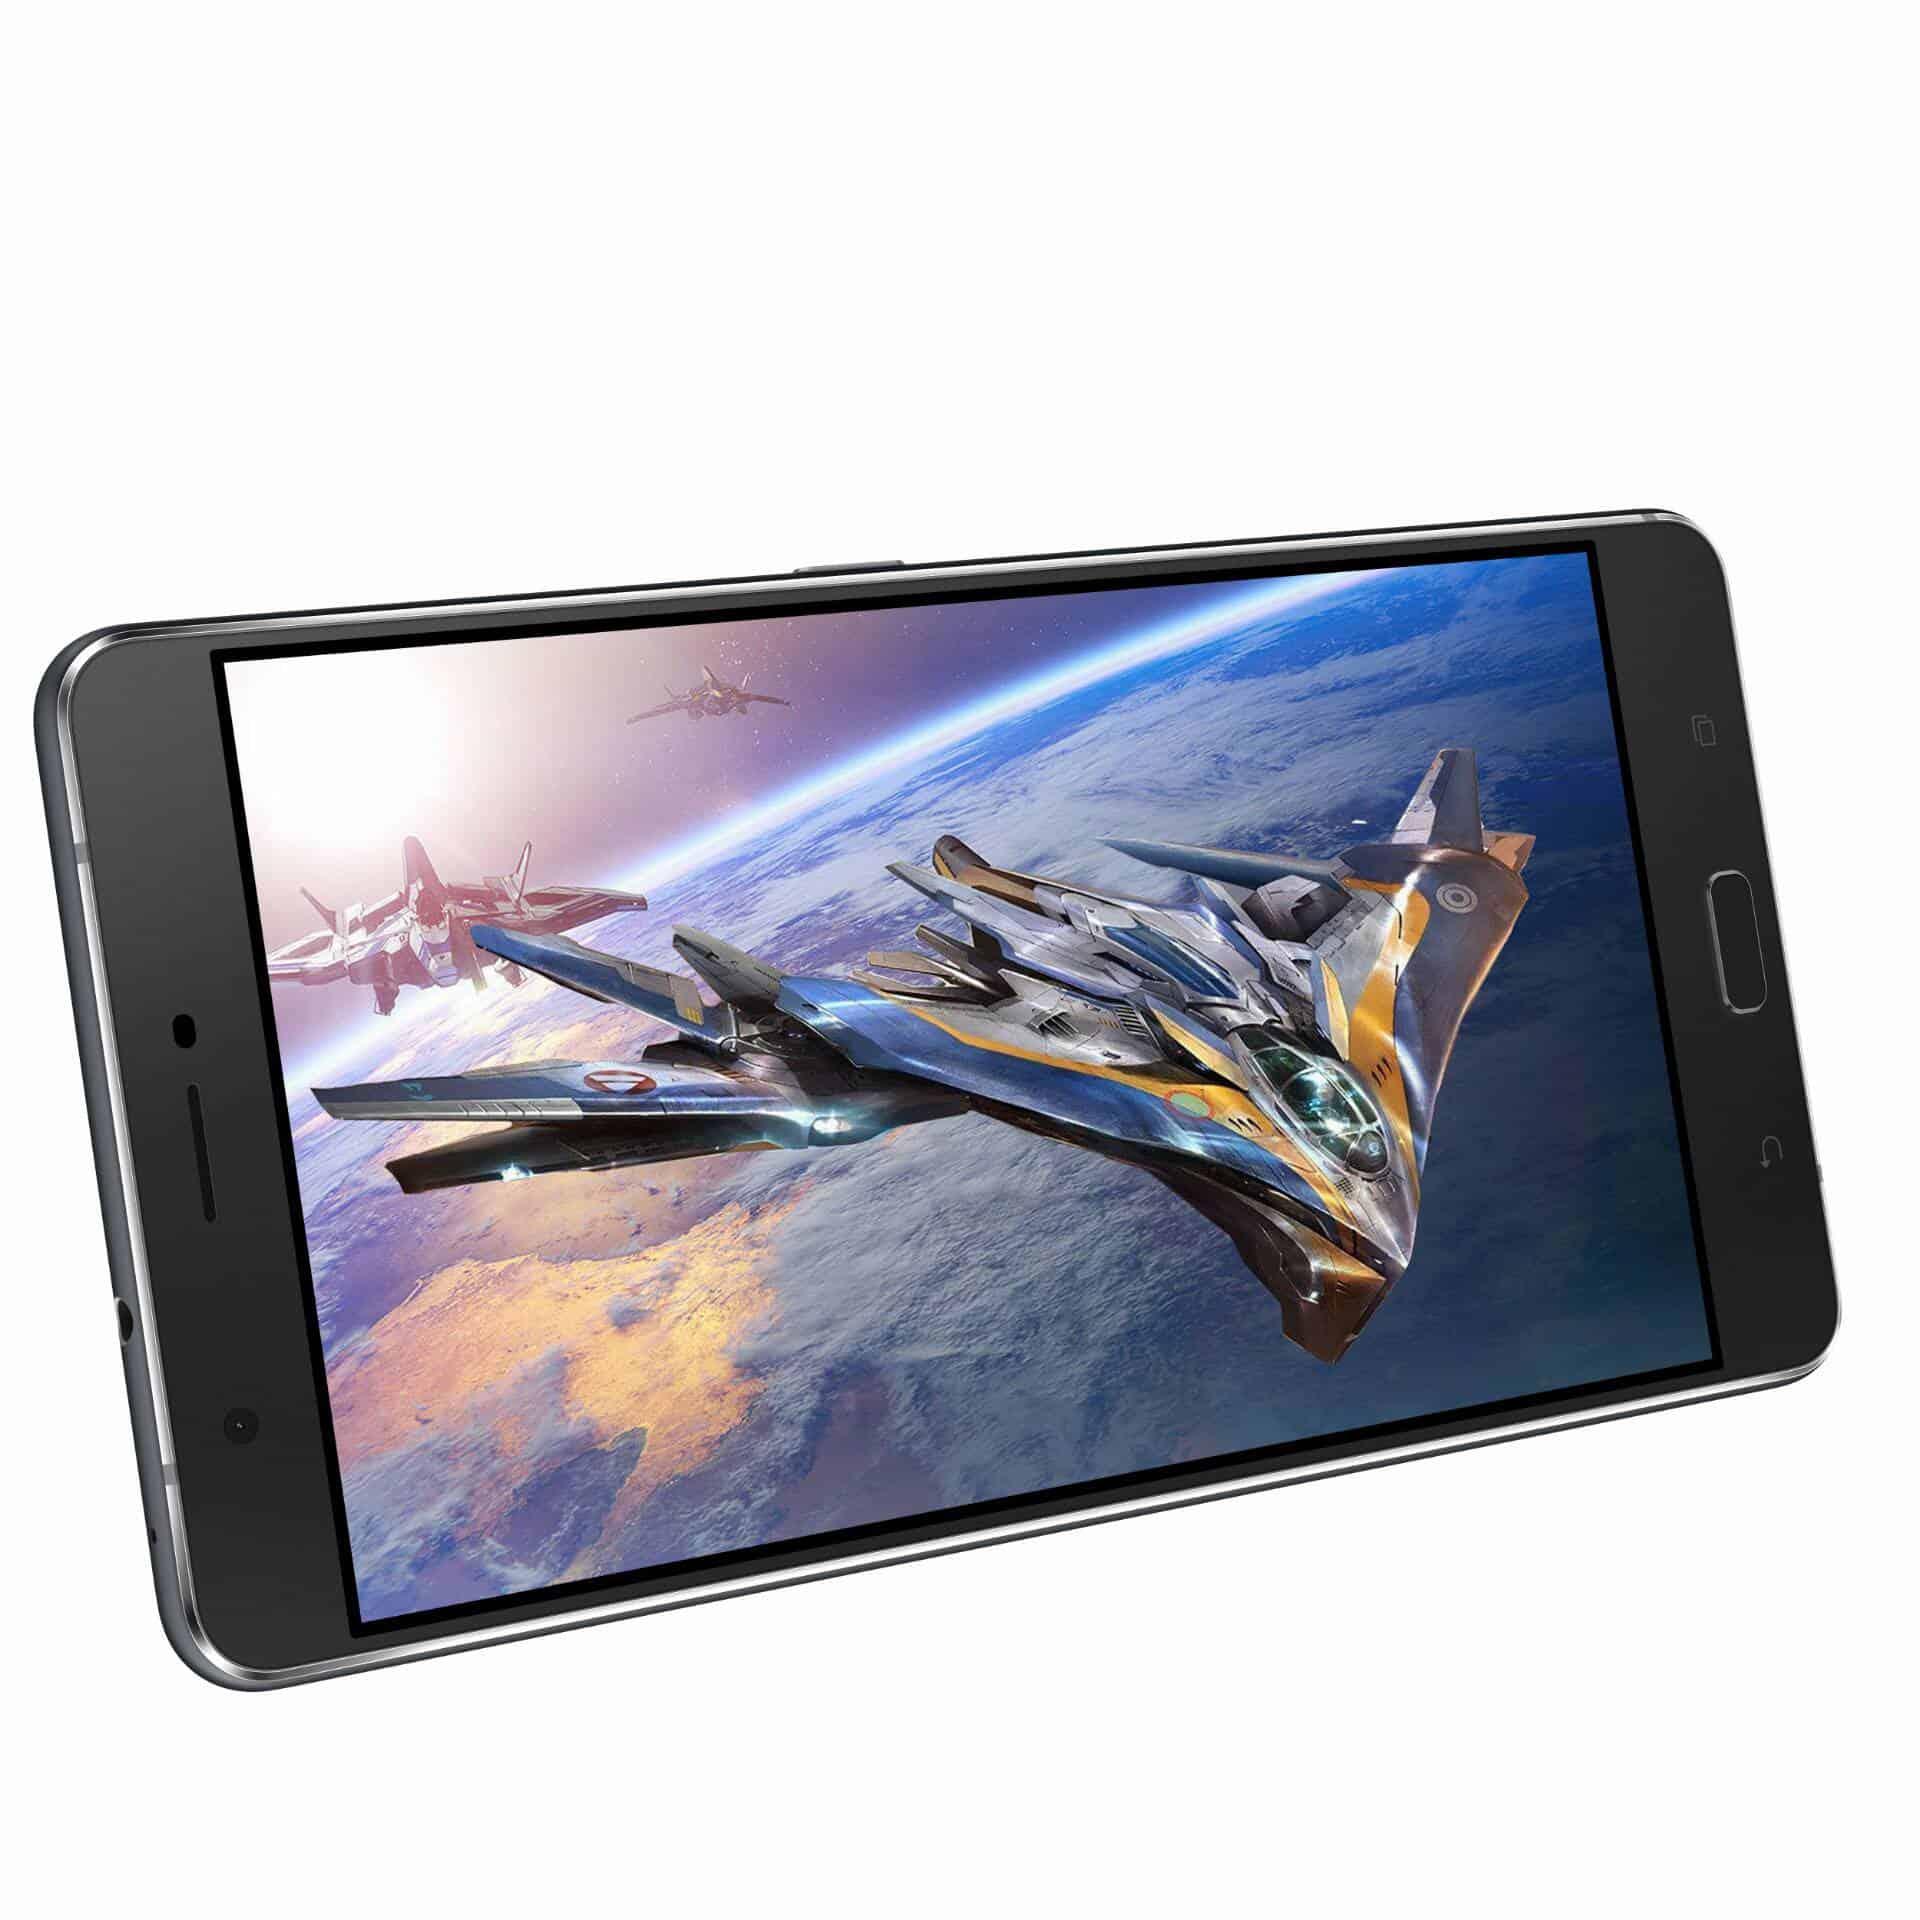 ASUS ZenFone 3 Ultra 27